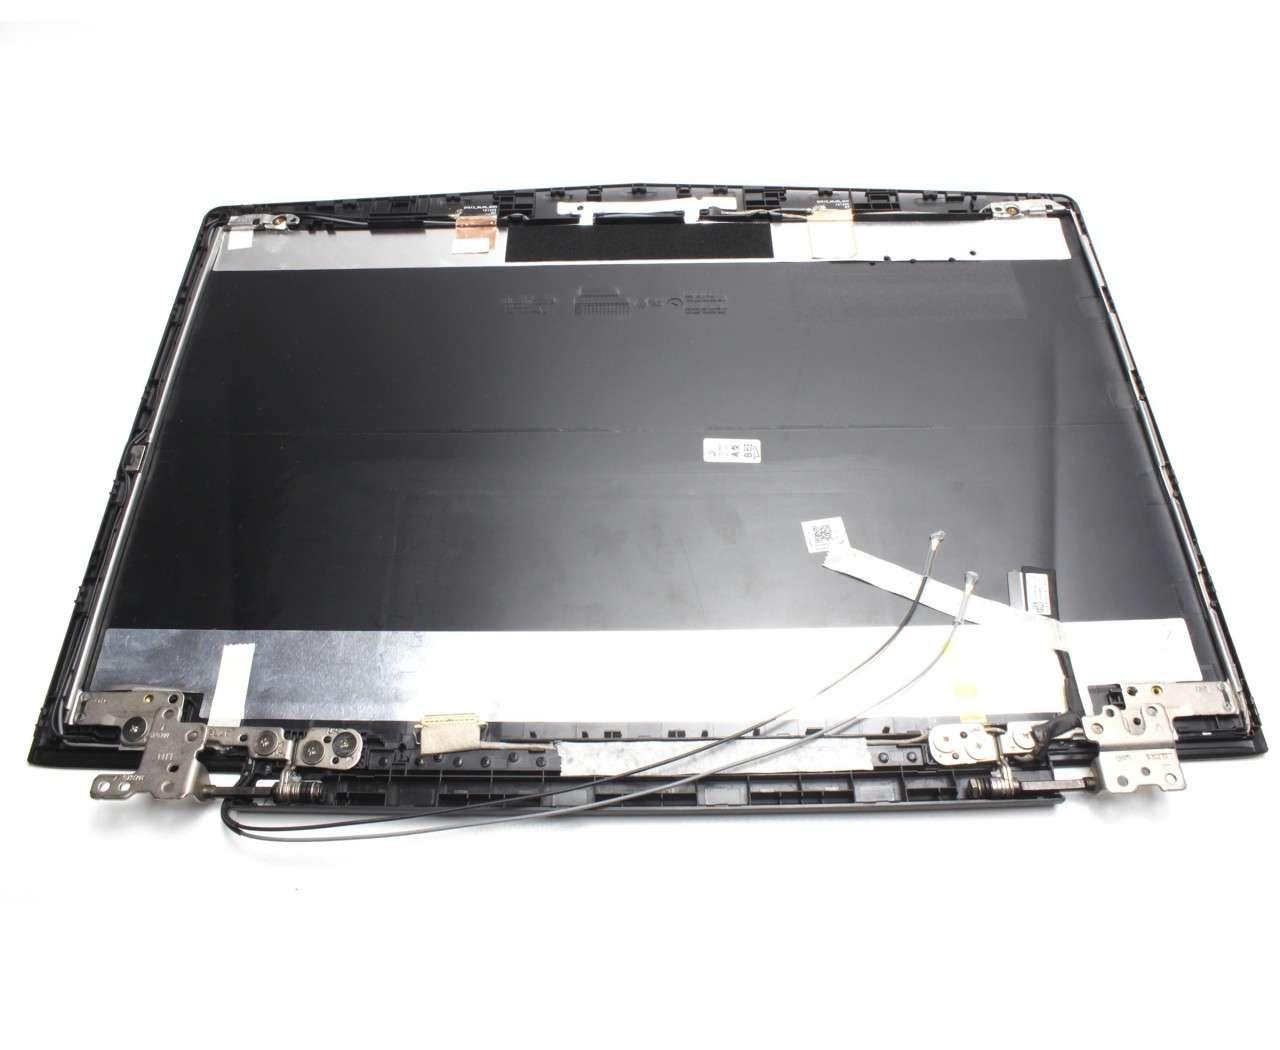 Capac Display BackCover Lenovo Legion Y520-15IKBA Carcasa Display cu Balamale imagine powerlaptop.ro 2021